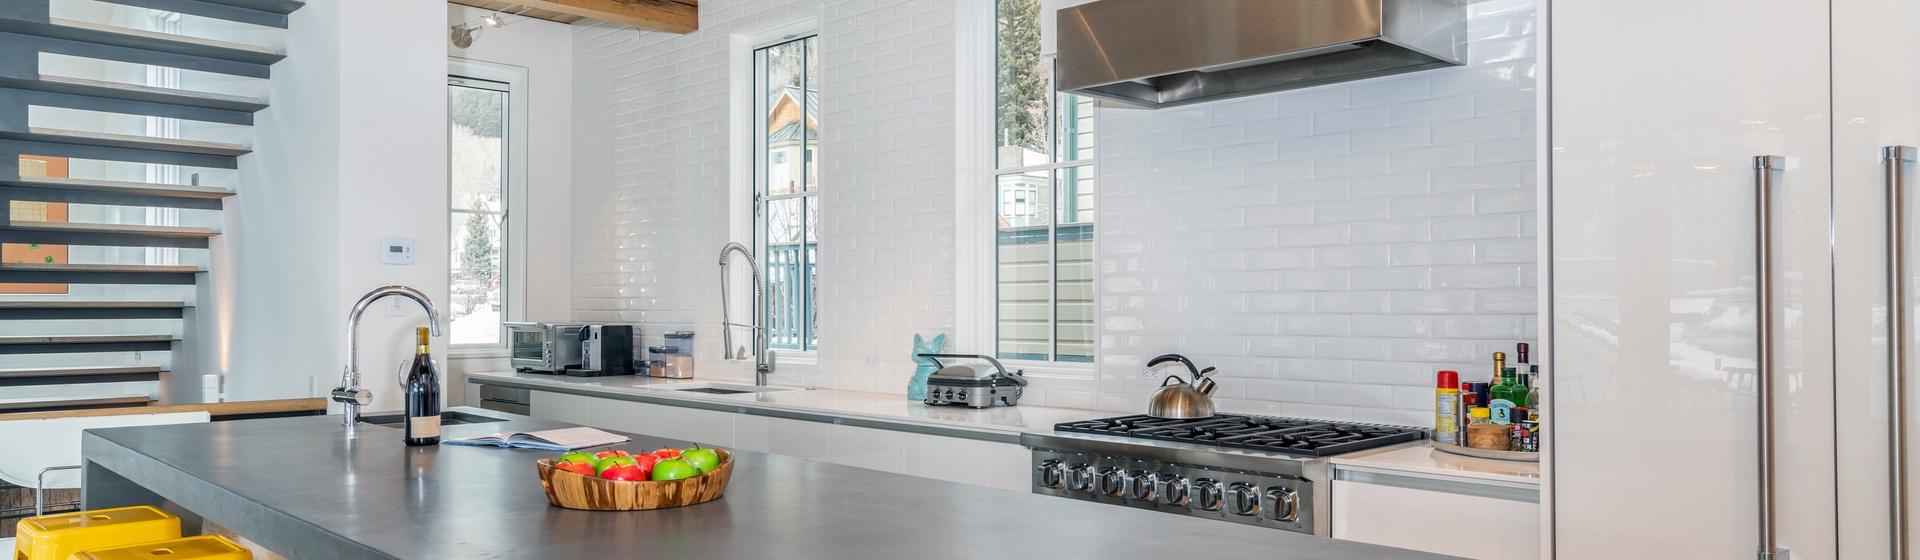 4-Telluride-The-Sunnyside-Kitchen-Island-Web.jpg